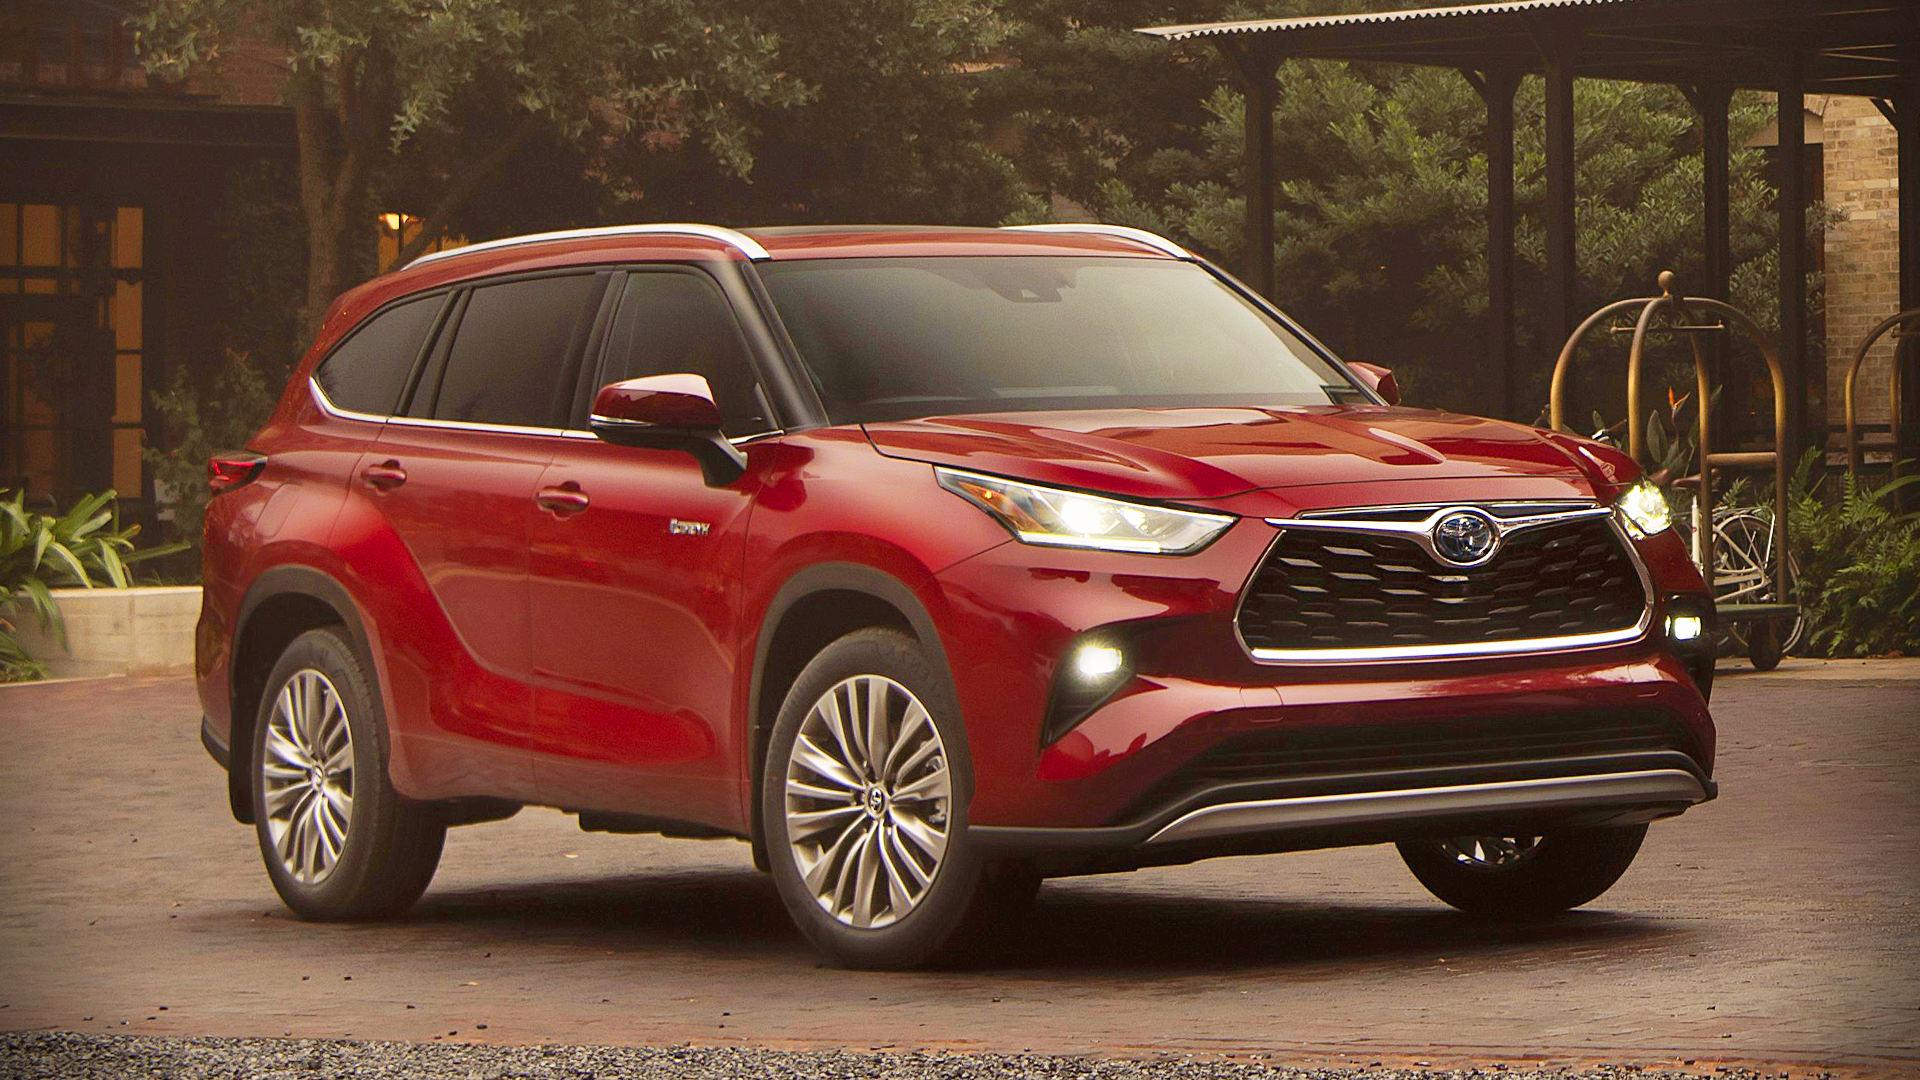 2020 Toyota Highlander Images Pictures